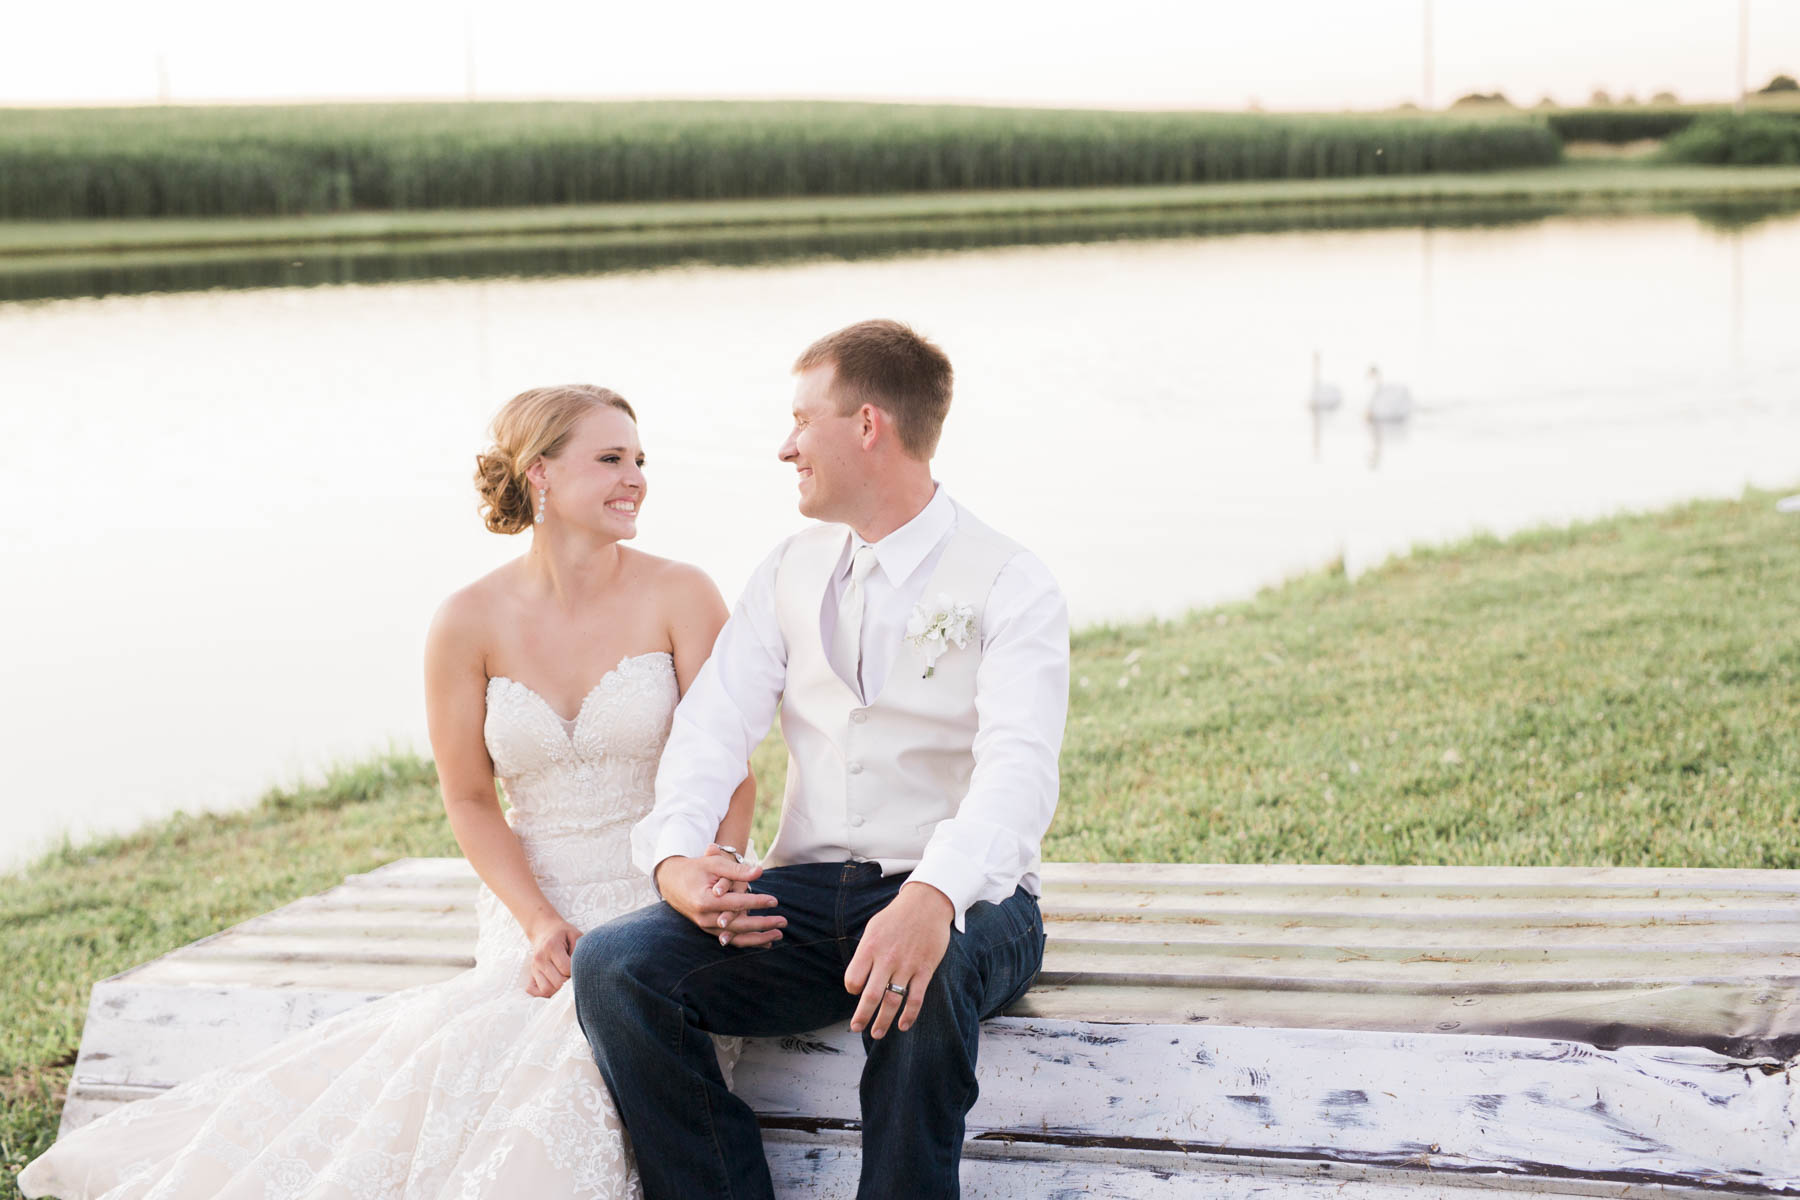 shotbychelsea_wedding_photography_blog-8.jpg